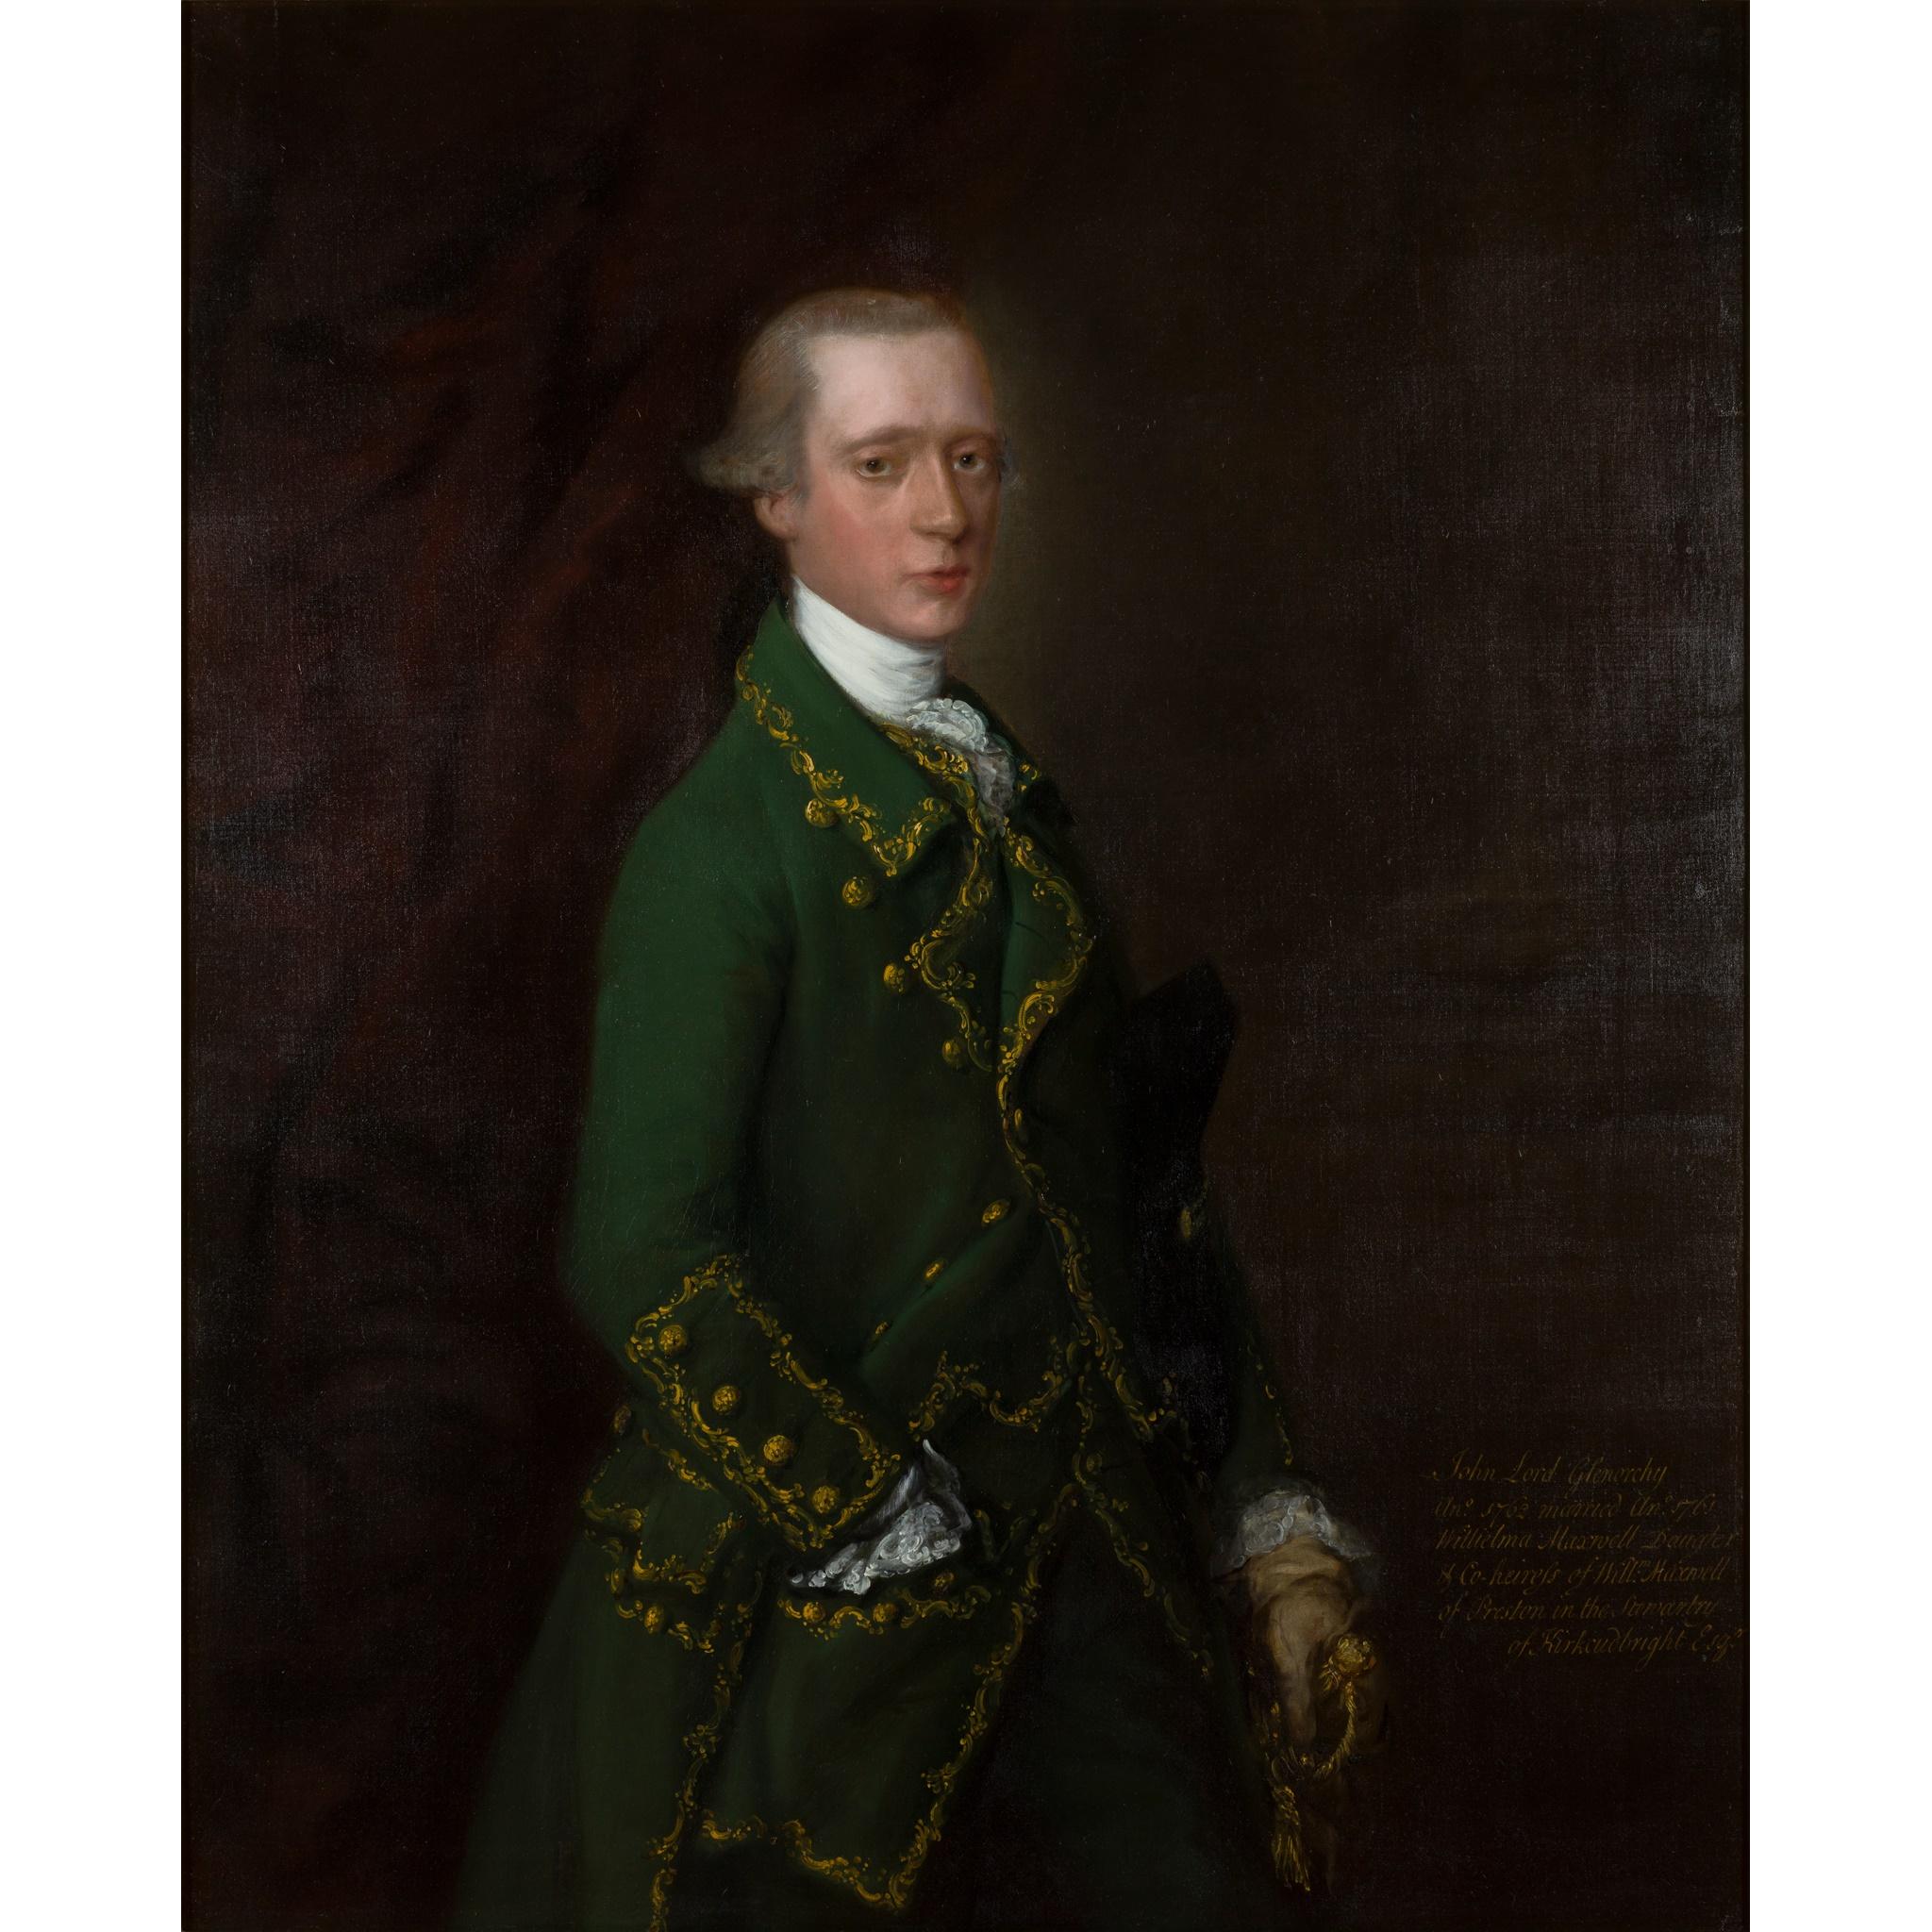 ◆ THOMAS GAINSBOROUGH R.A. (BRITISH 1717-1788) HALF-LENGTH PORTRAIT OF JOHN CAMPBELL, VISCOUNT